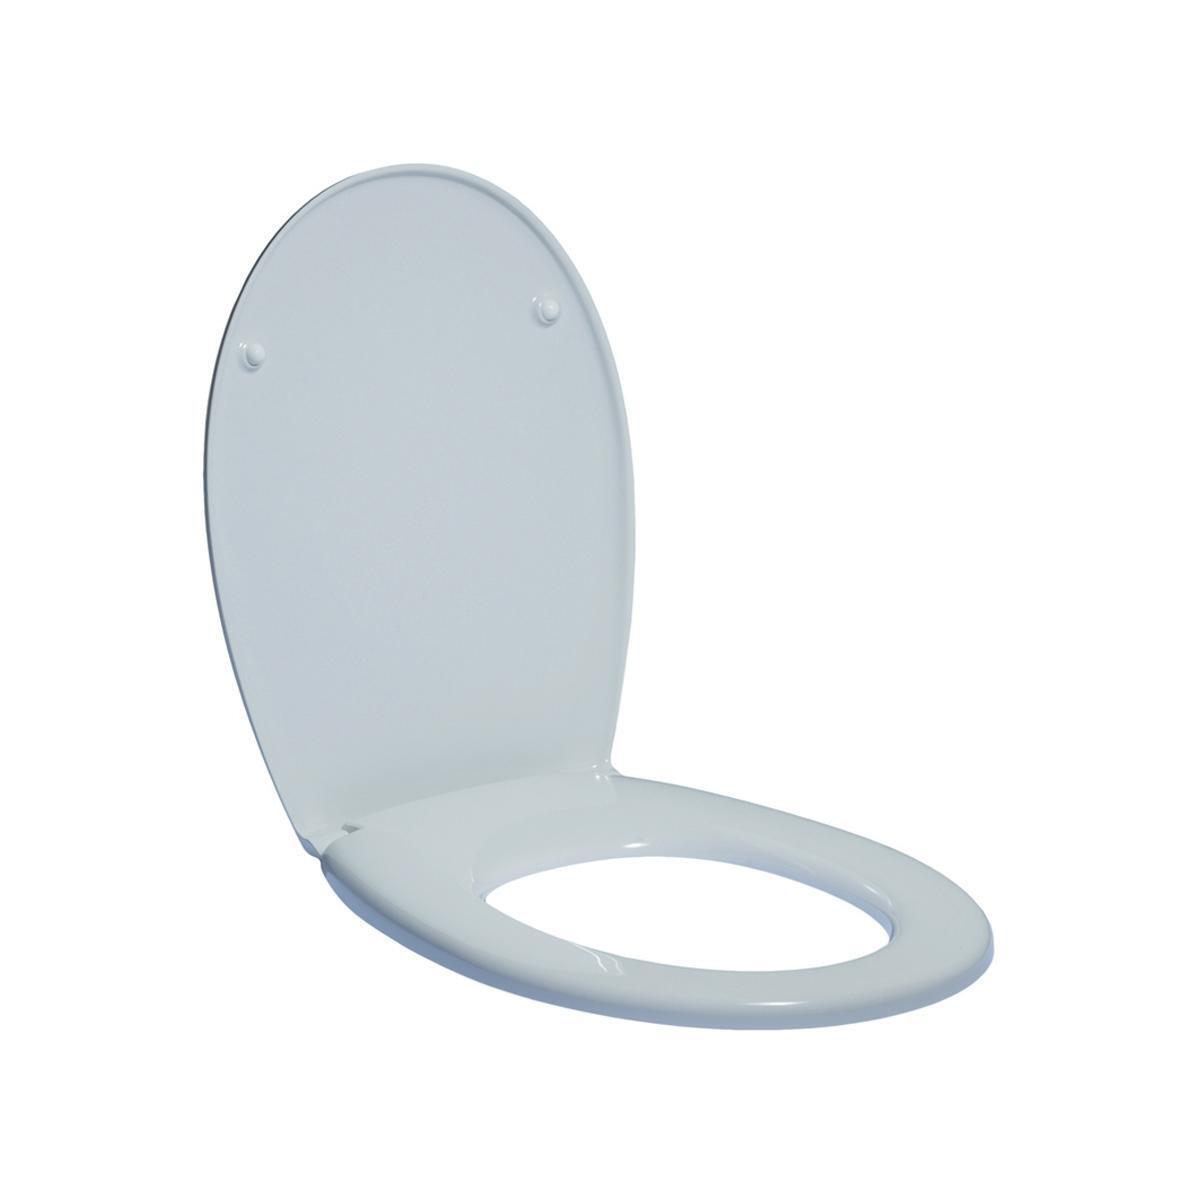 Copriwater ovale Originale per serie sanitari Miky New IDEAL STANDARD termoindurente bianco - 8